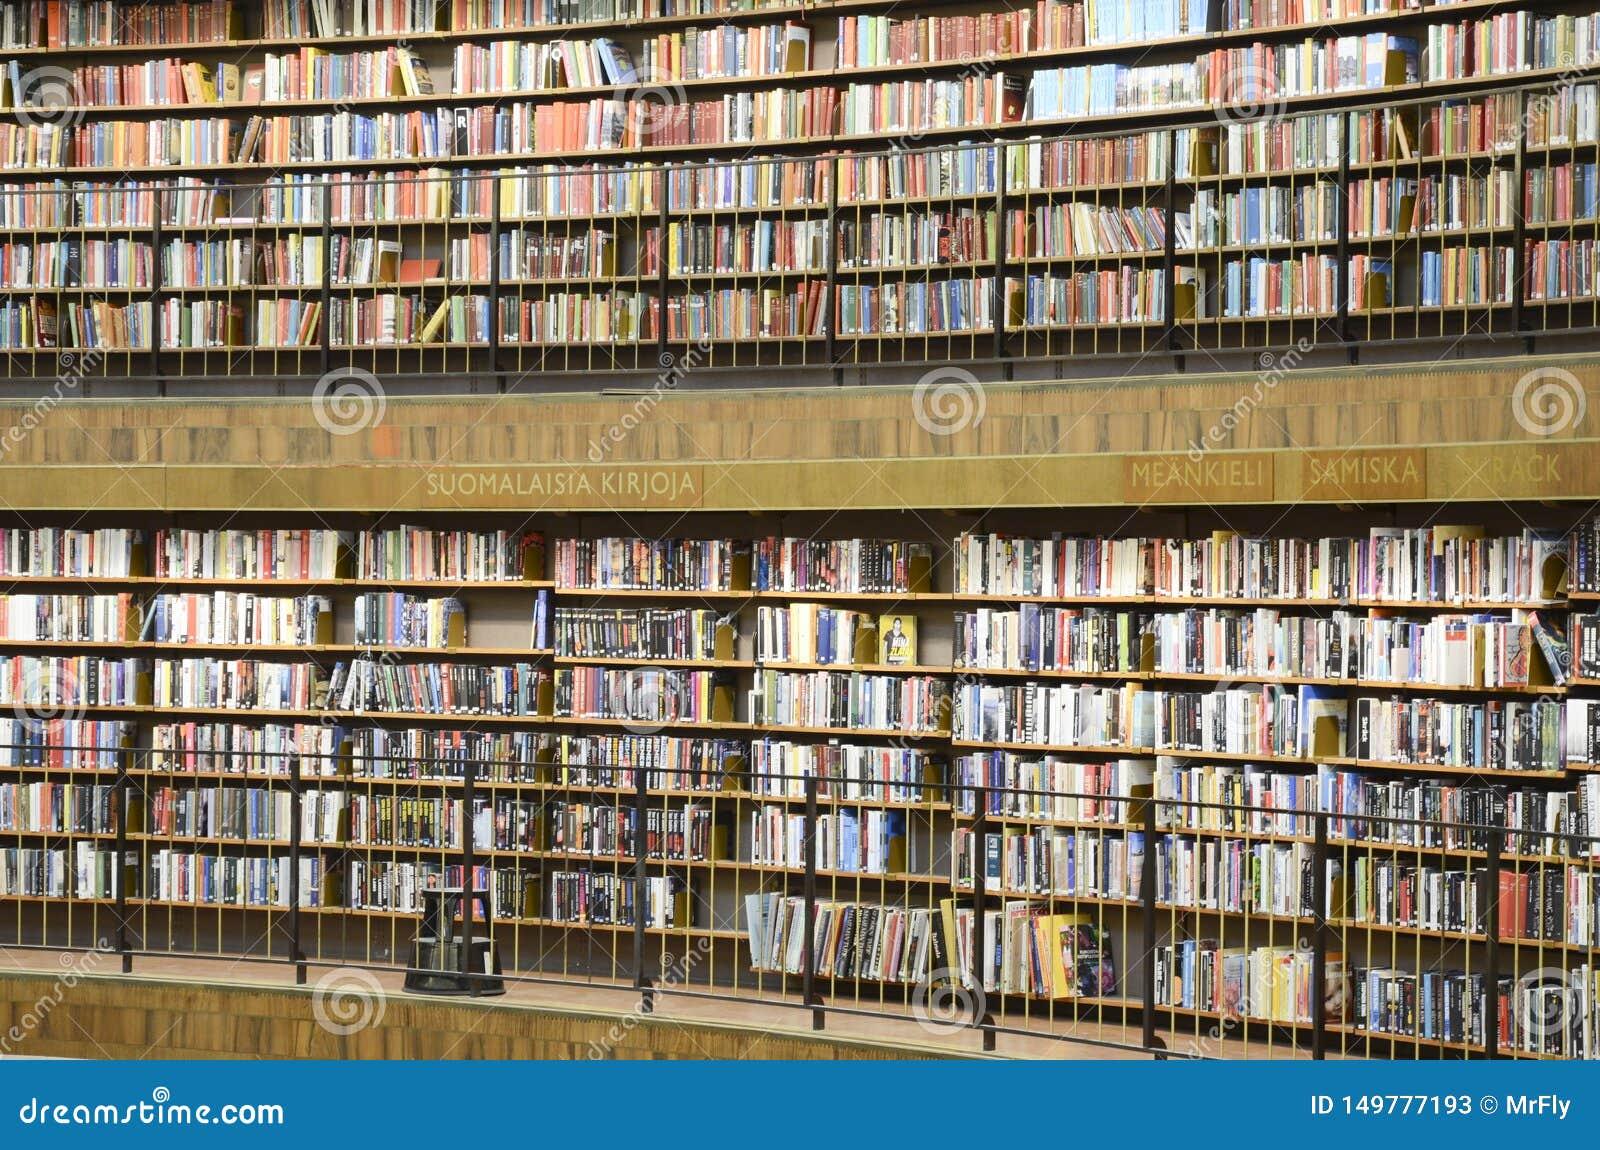 Circular public library, Stockholm, Sweden